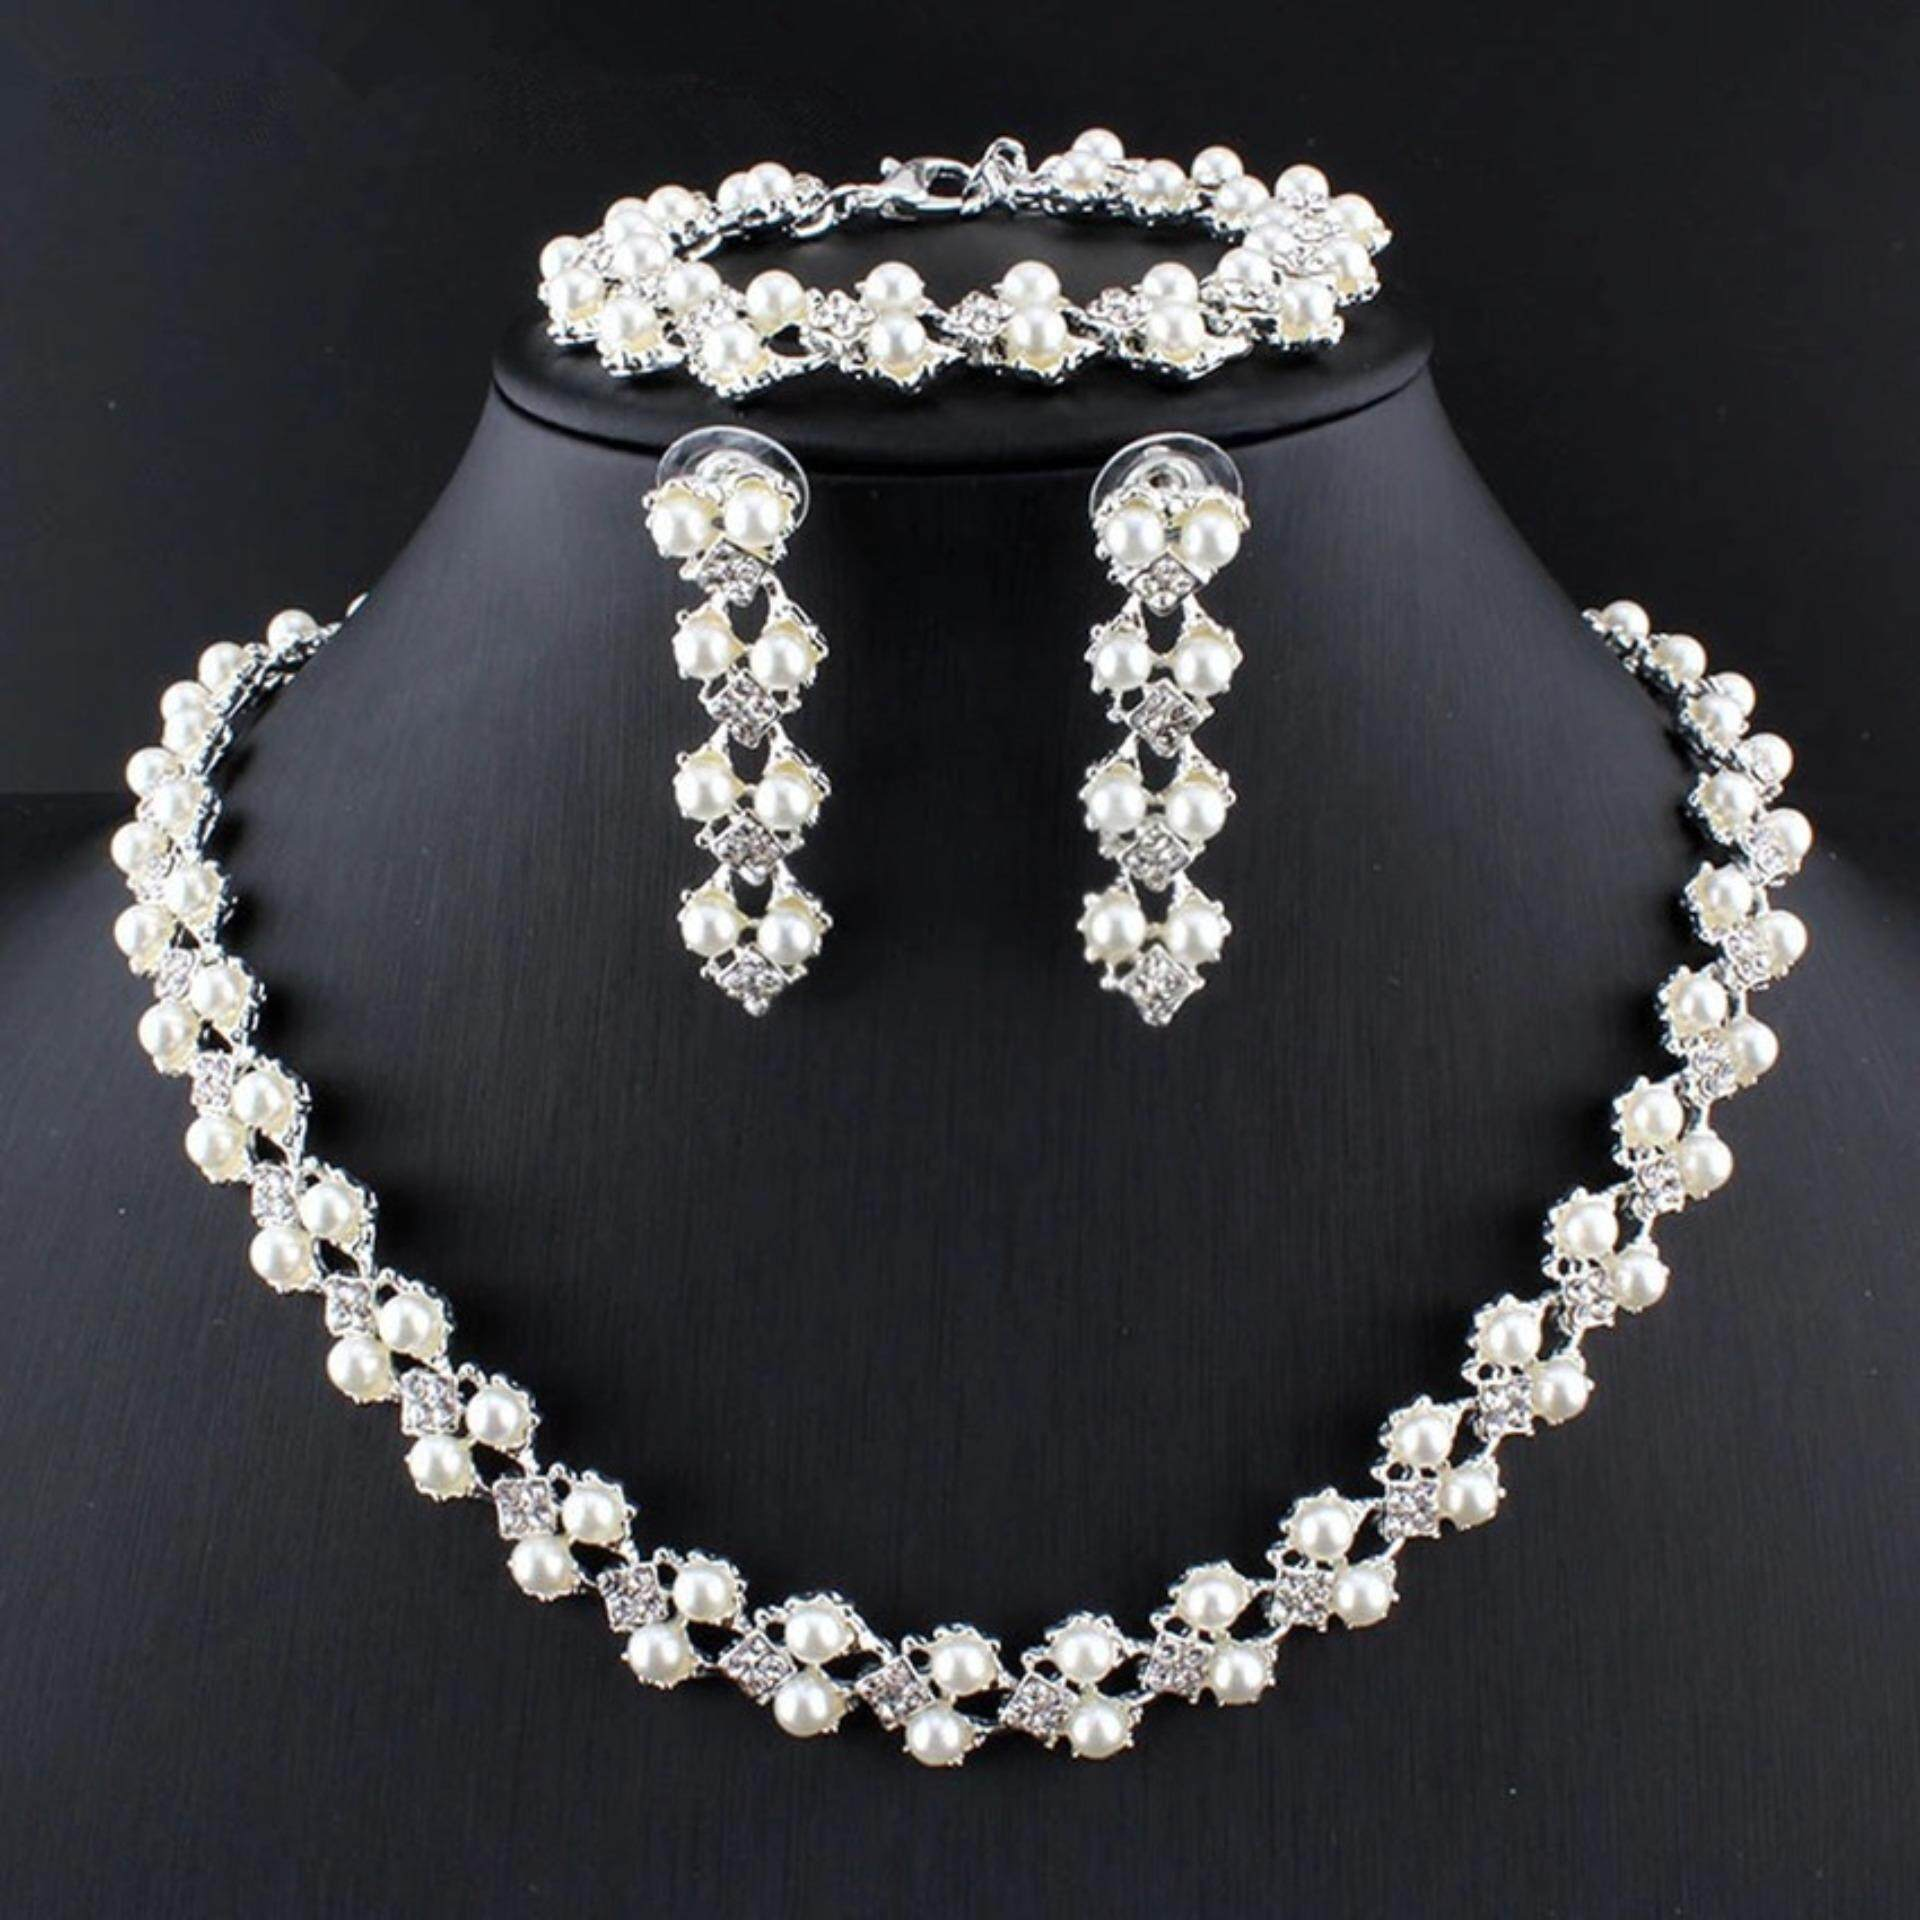 Kehebatan Whyus Tahan Trendi 6 Pairs Set Buatan Mutiara Berlian 1 Perhiasan Perak Elegan Wanita Imitasi Pengantin Kalung Anting Baru Tatahan Gelang